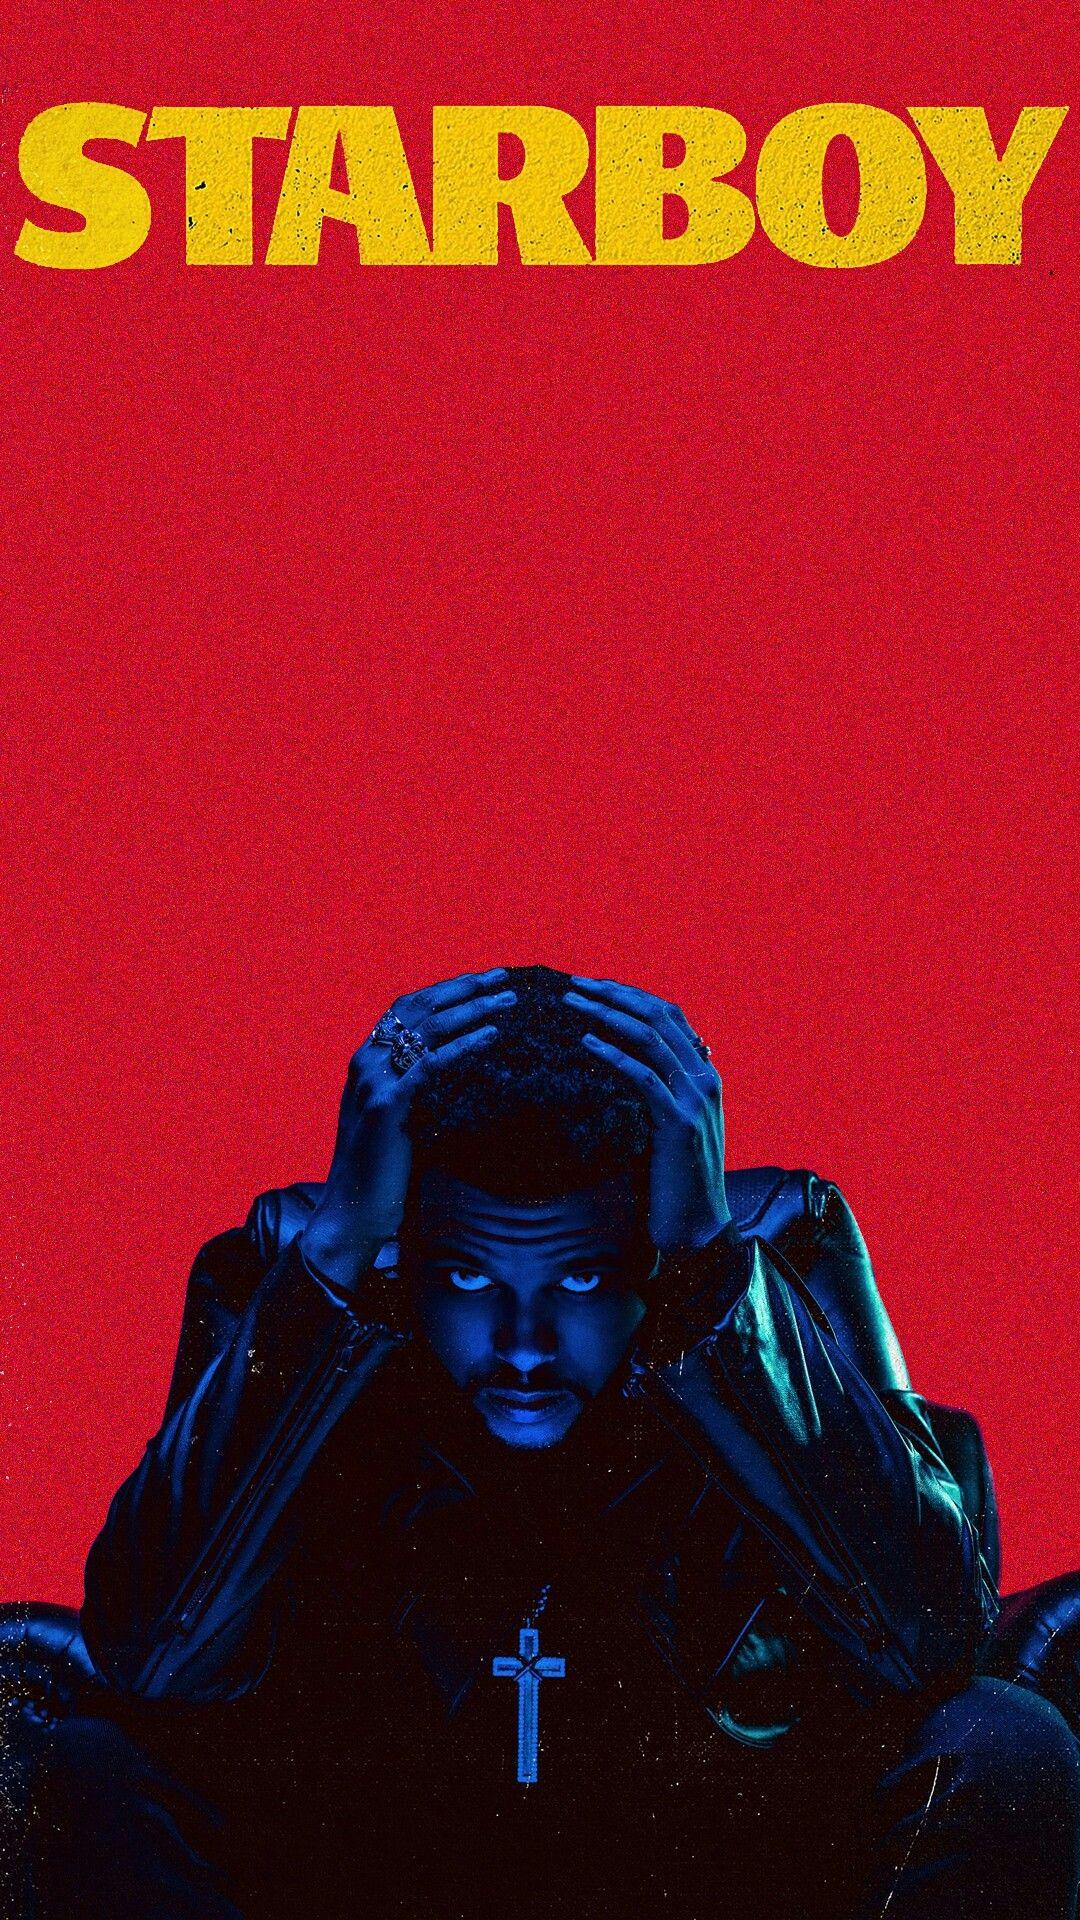 The Weeknd 1080x1920 wallpaper Immagini, Sfondi, Sfondi